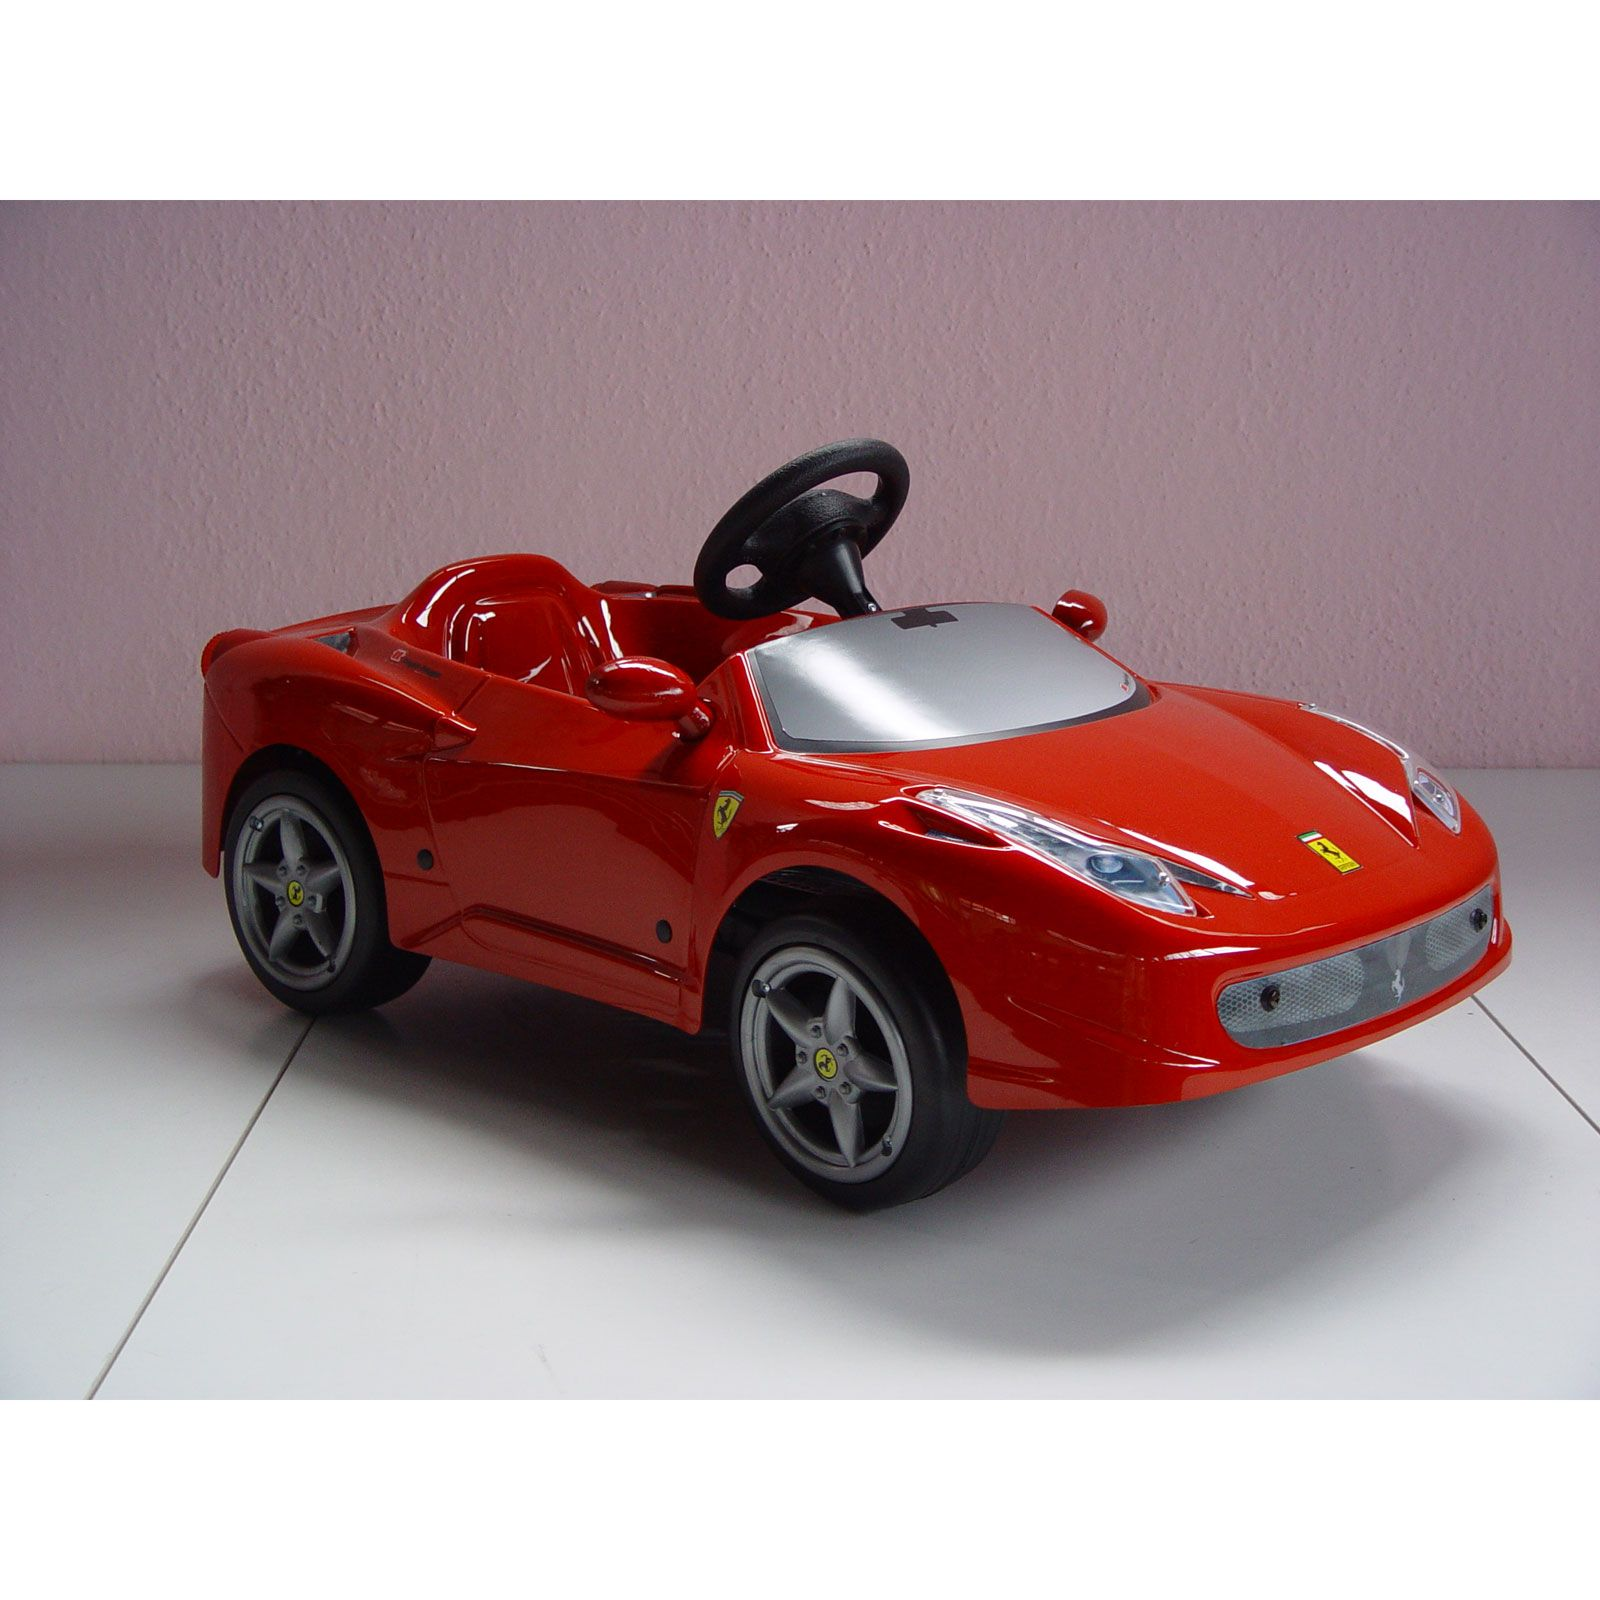 ferrari f458 voiture p dales vintage toy cars pinterest voiture et ferrari. Black Bedroom Furniture Sets. Home Design Ideas